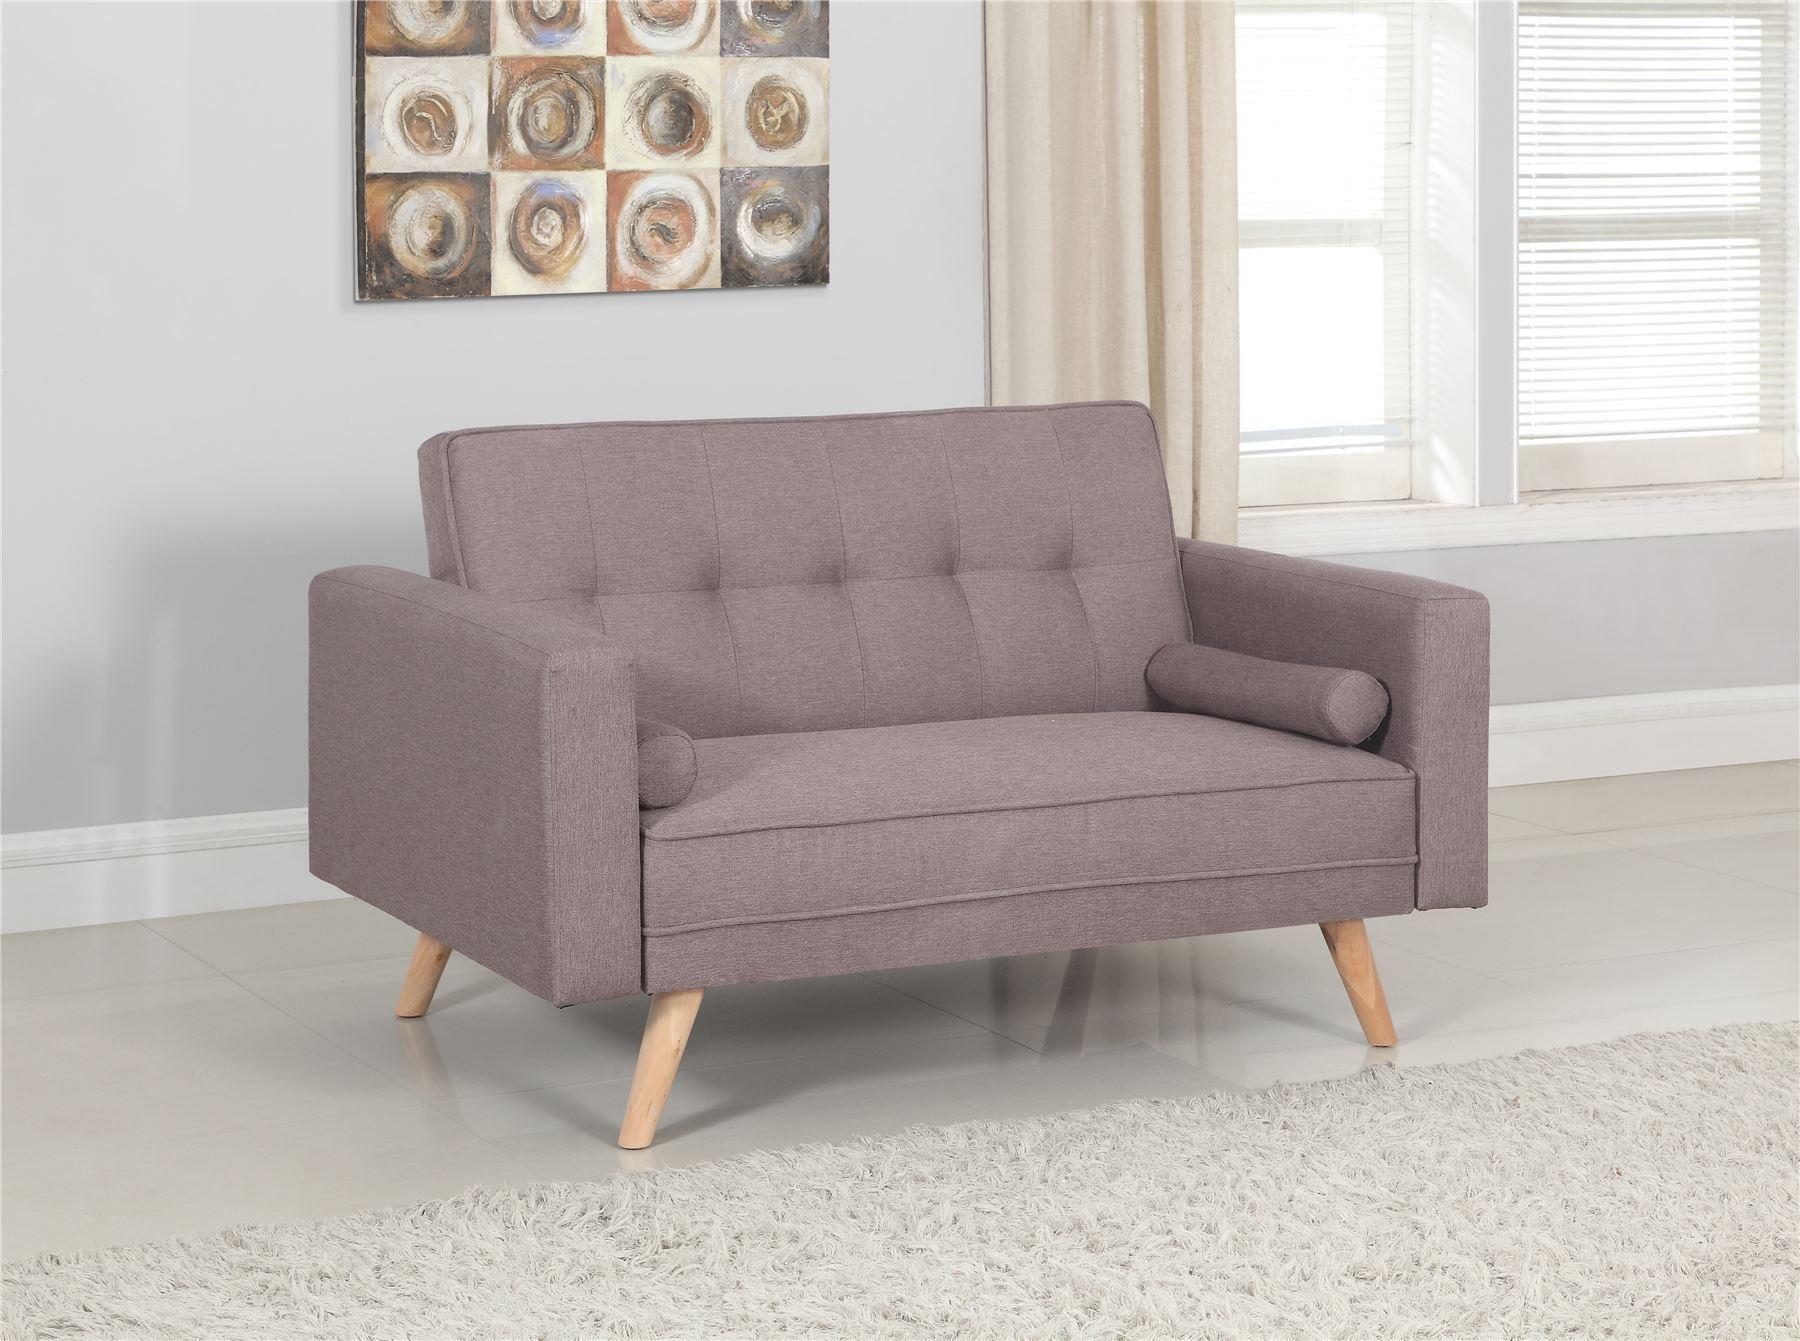 Birela Ethan Medium Sofa Bed 20 Seater Settee Grey Fabric Scandinavian Style